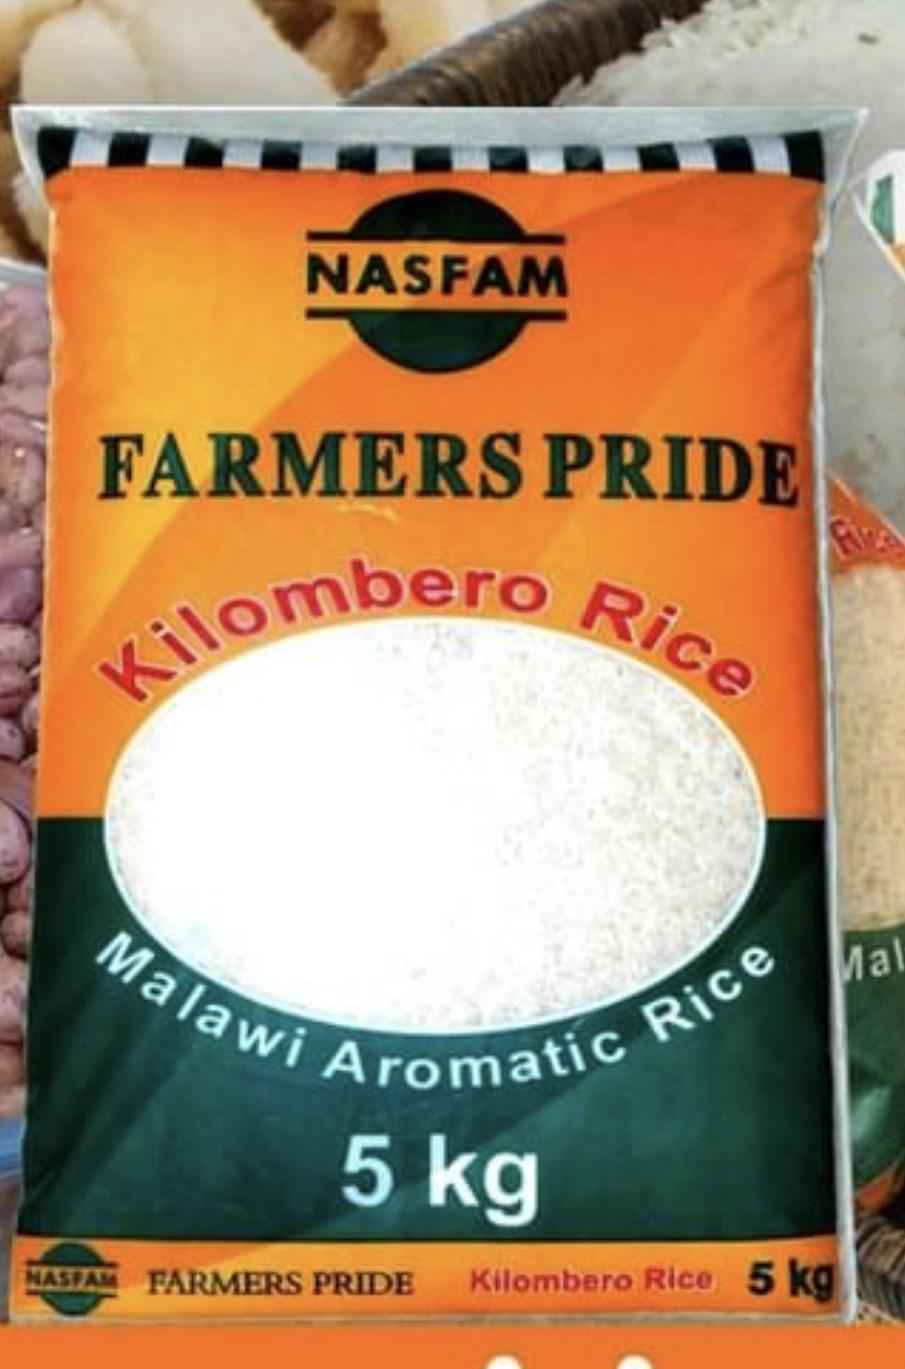 Nasfam Kilombero Rice 5kg